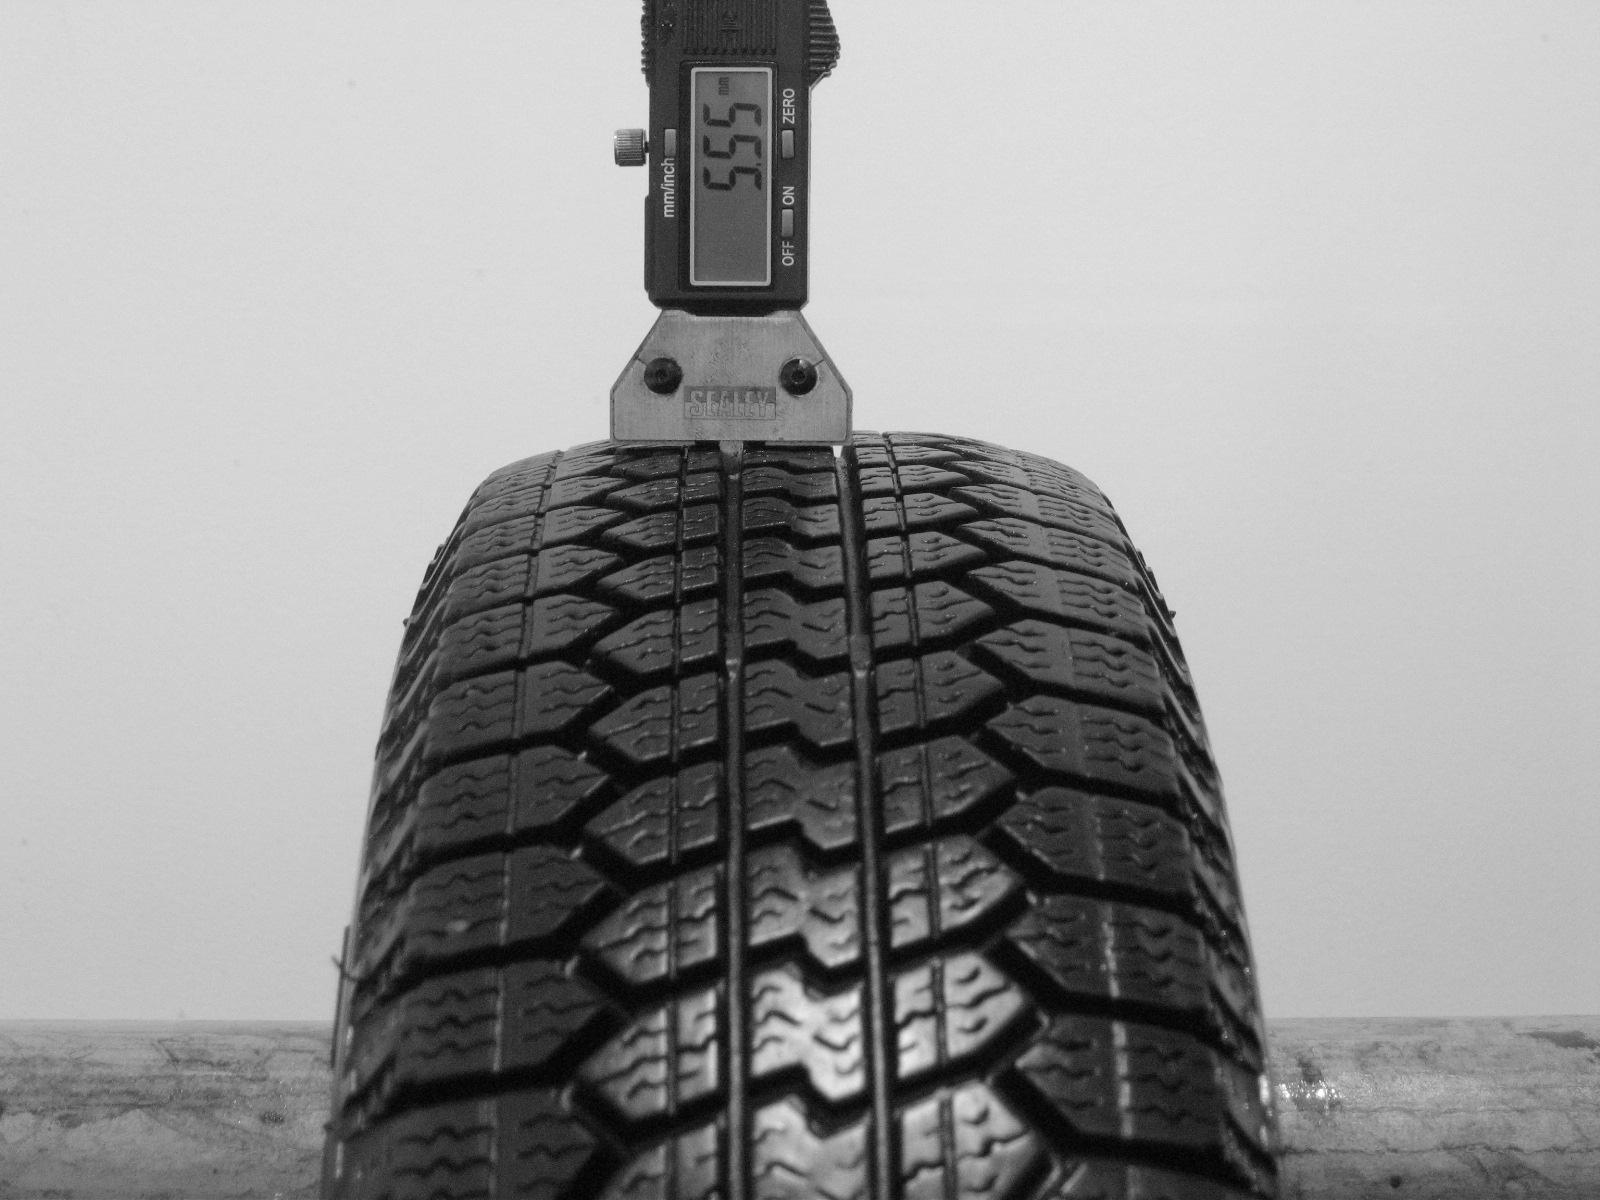 Použité-Pneu-Bazar - 145/80 R13 HANKOOK ZOVAC 2000 M+S-kusovka-rezerva 3mm